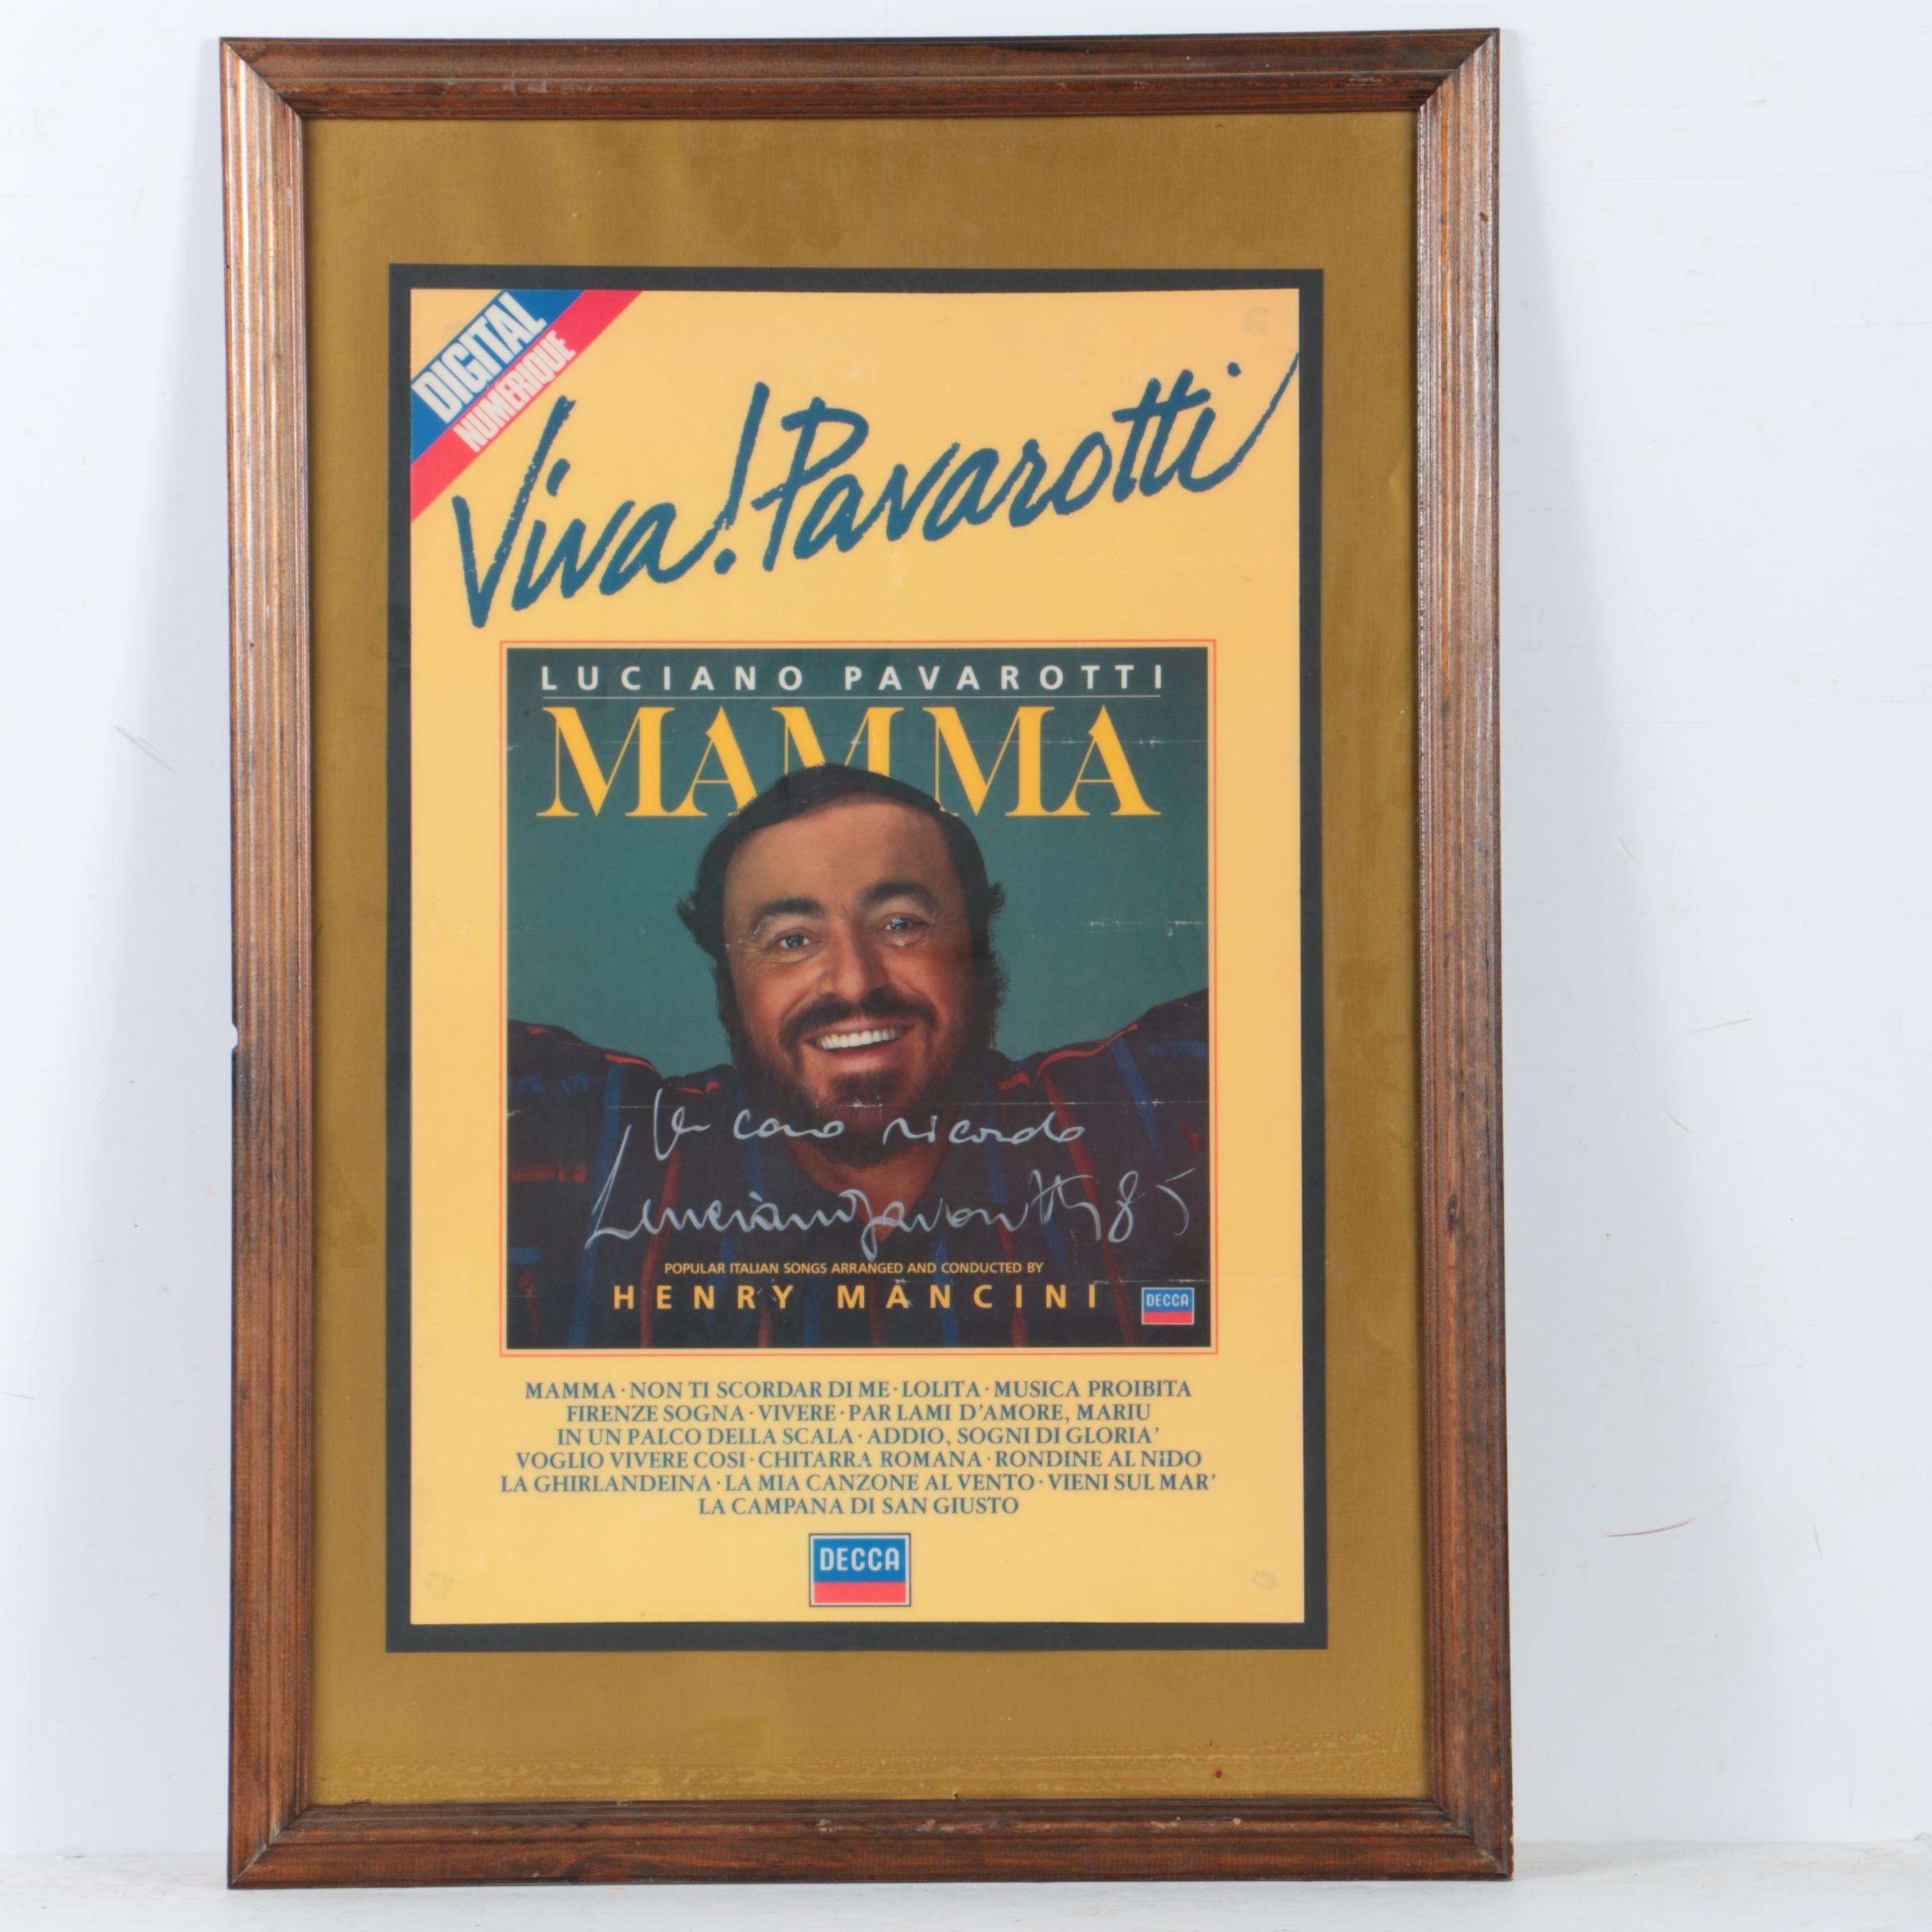 "Luciano Pavarotti Autographed Offset Lithograph Poster ""Viva! Pavarotti"""